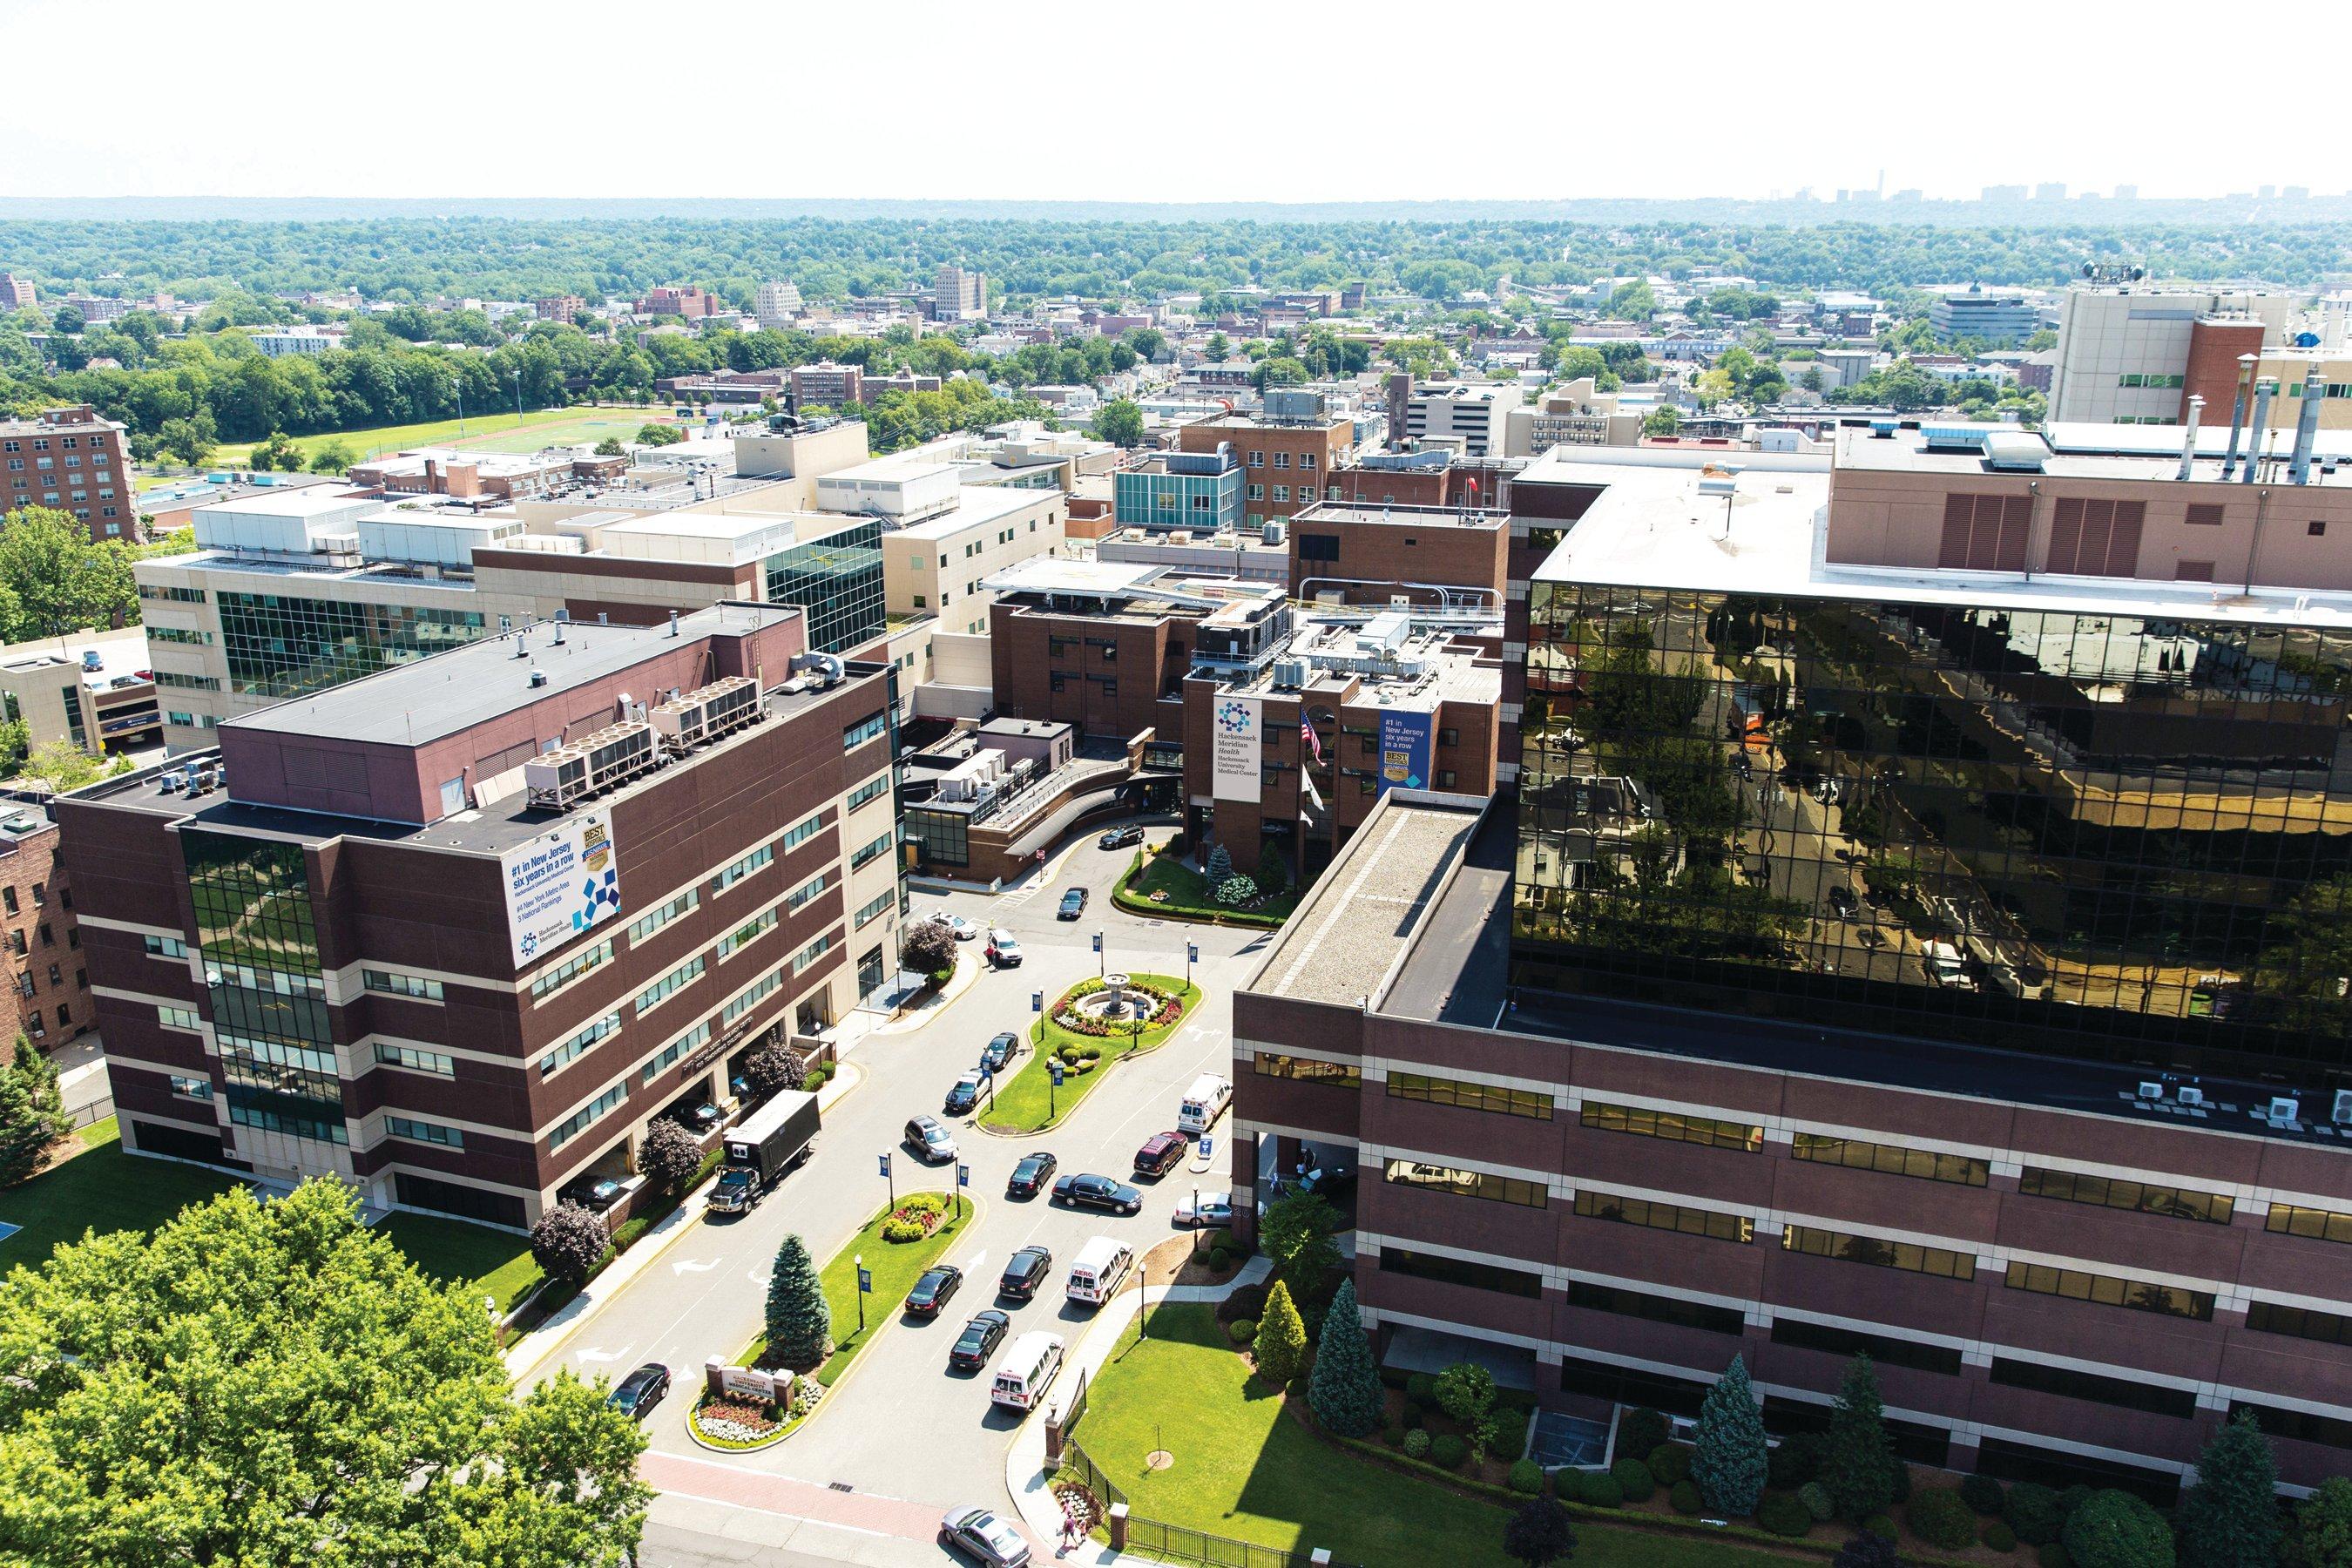 Hackensack Meridian Health Hackensack University Medical Center